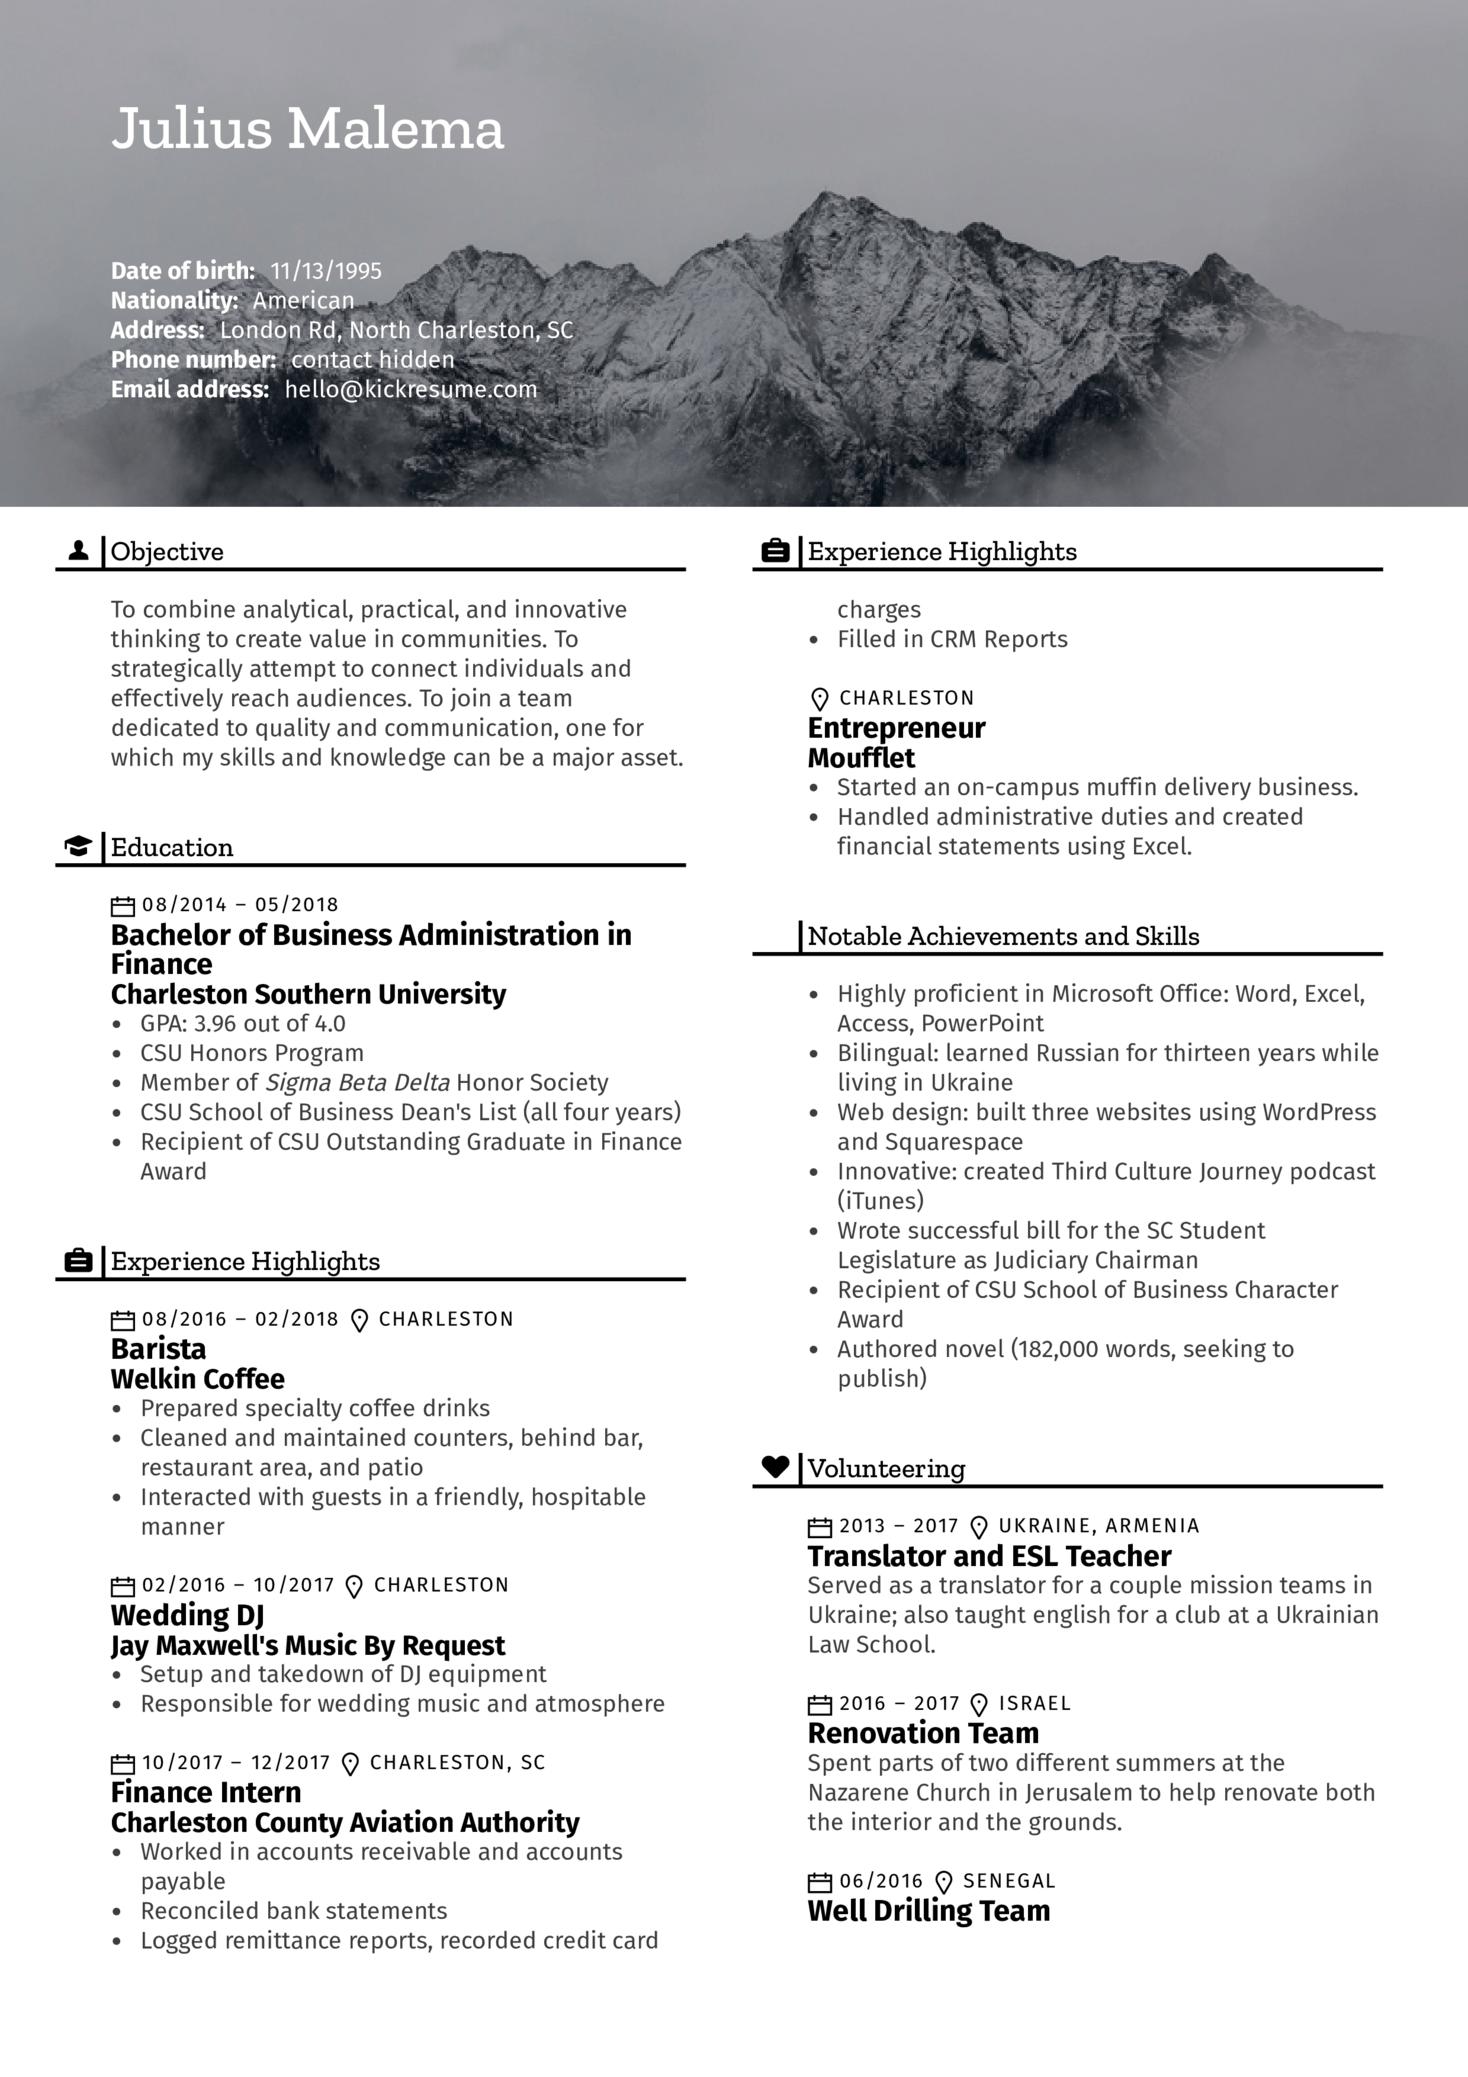 Finance Intern Resume Example (parte 1)